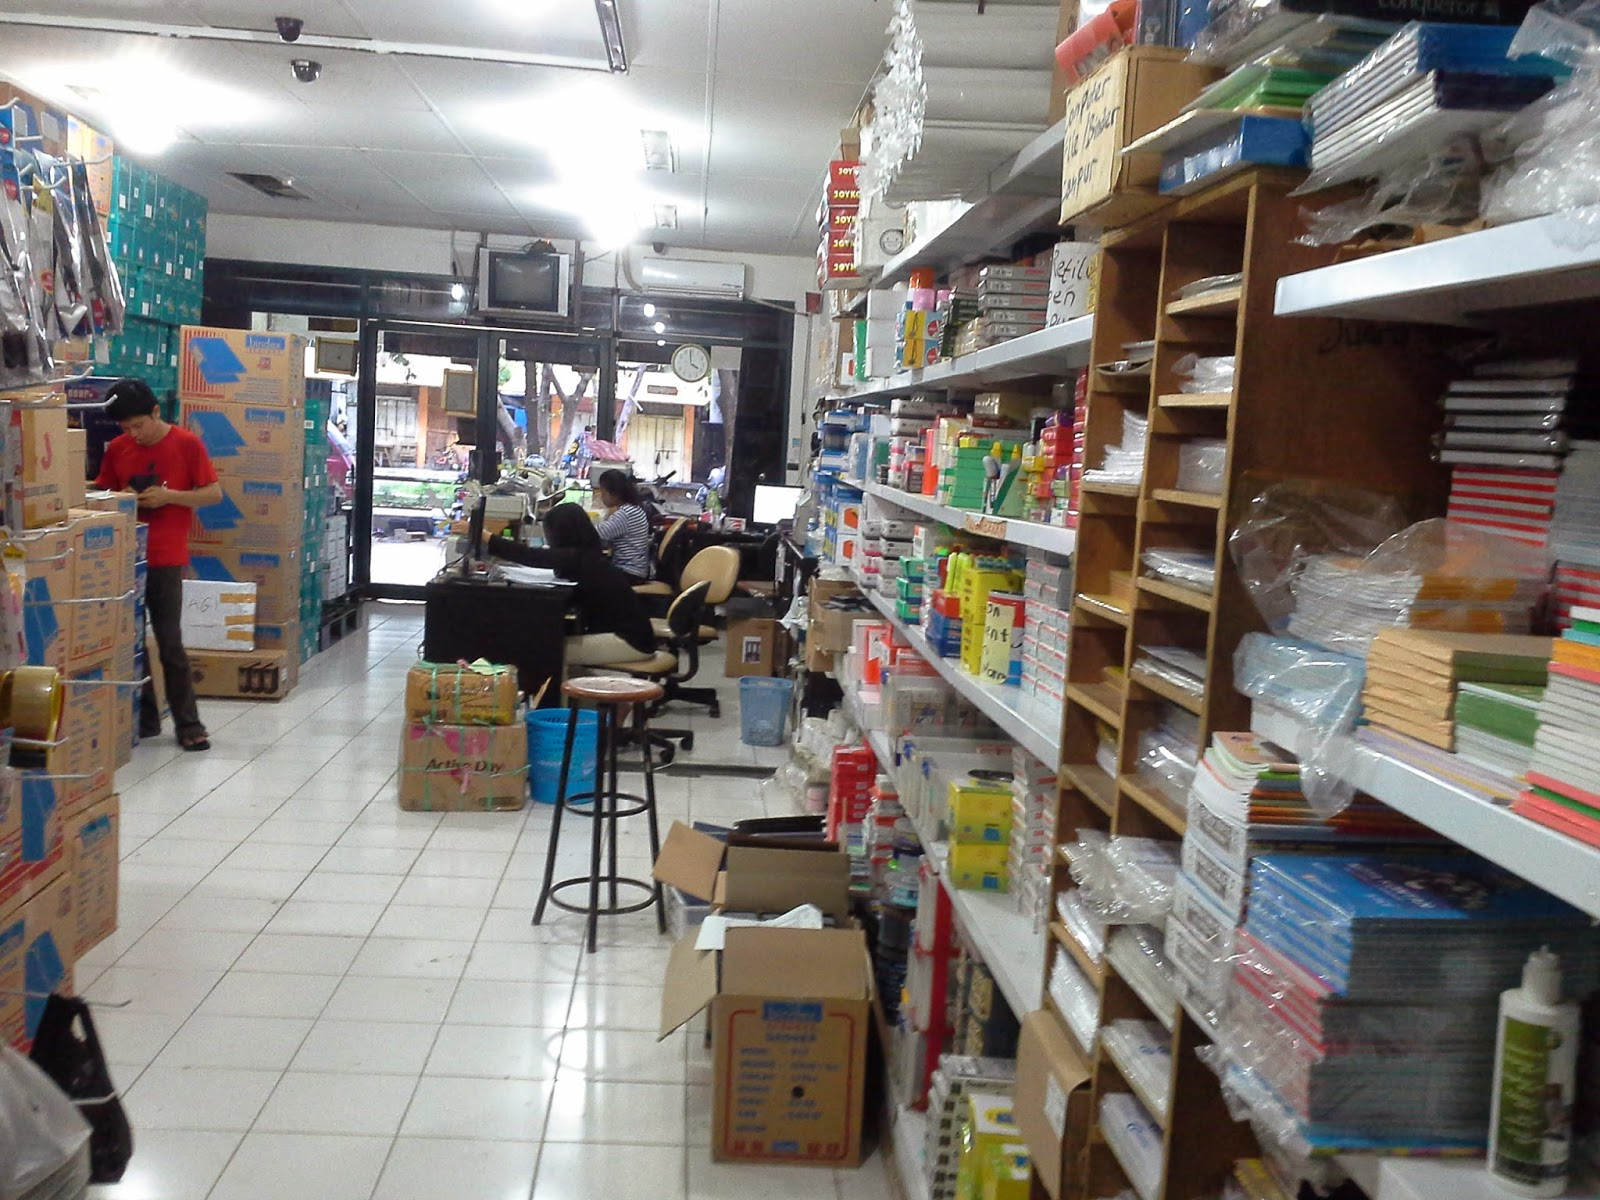 Toko stationery grosir dan Eceran sekitar Pasar Pagi -  Mangga Dua